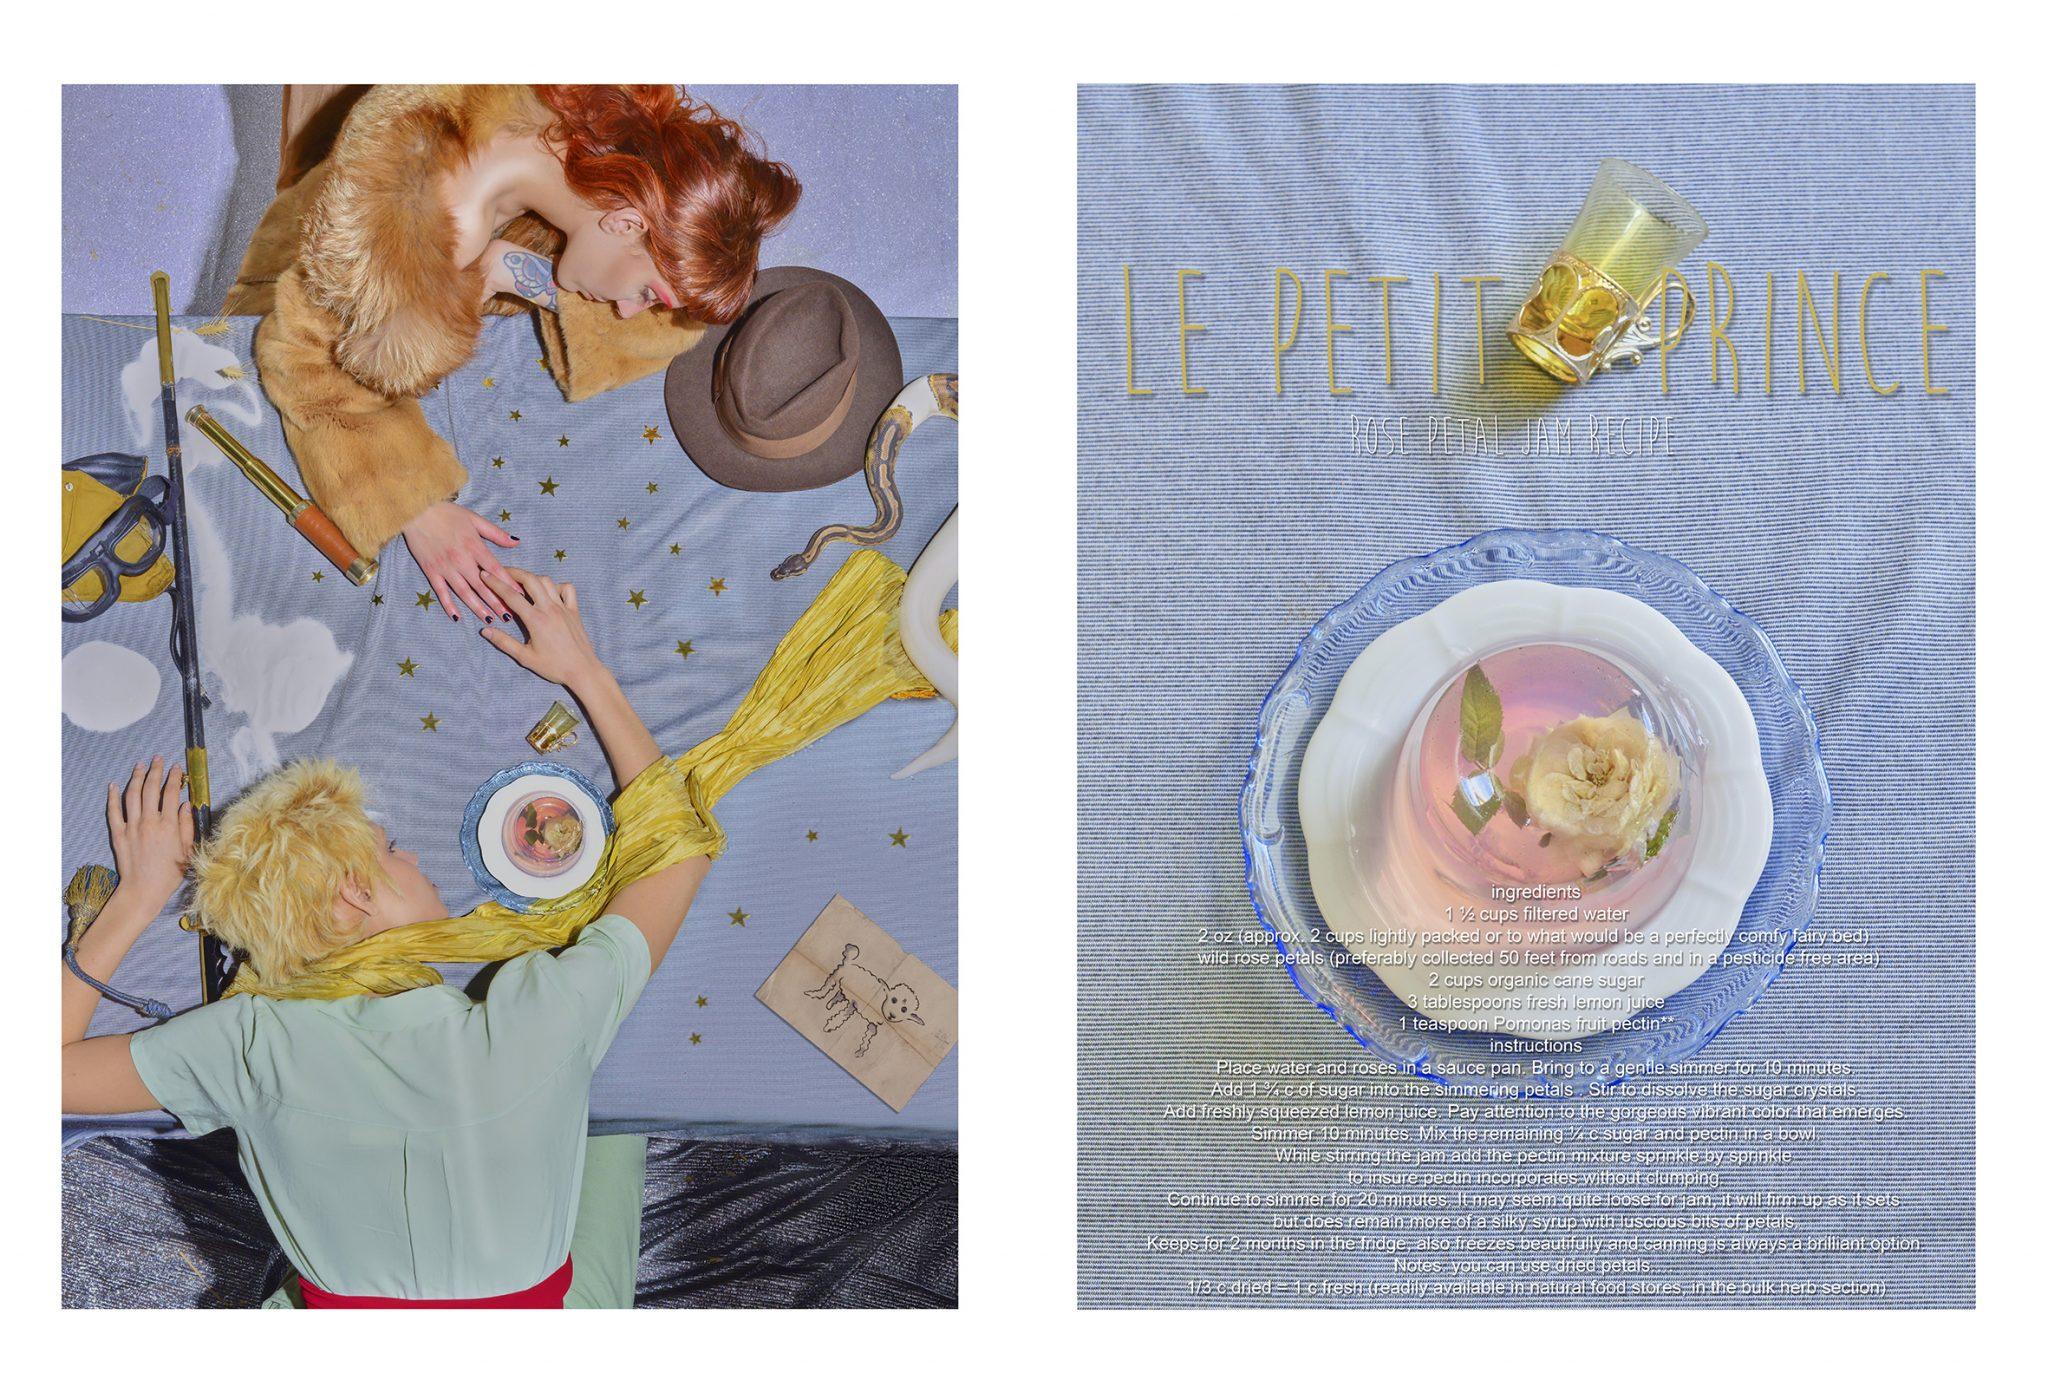 le petit prince and the rose petal jam